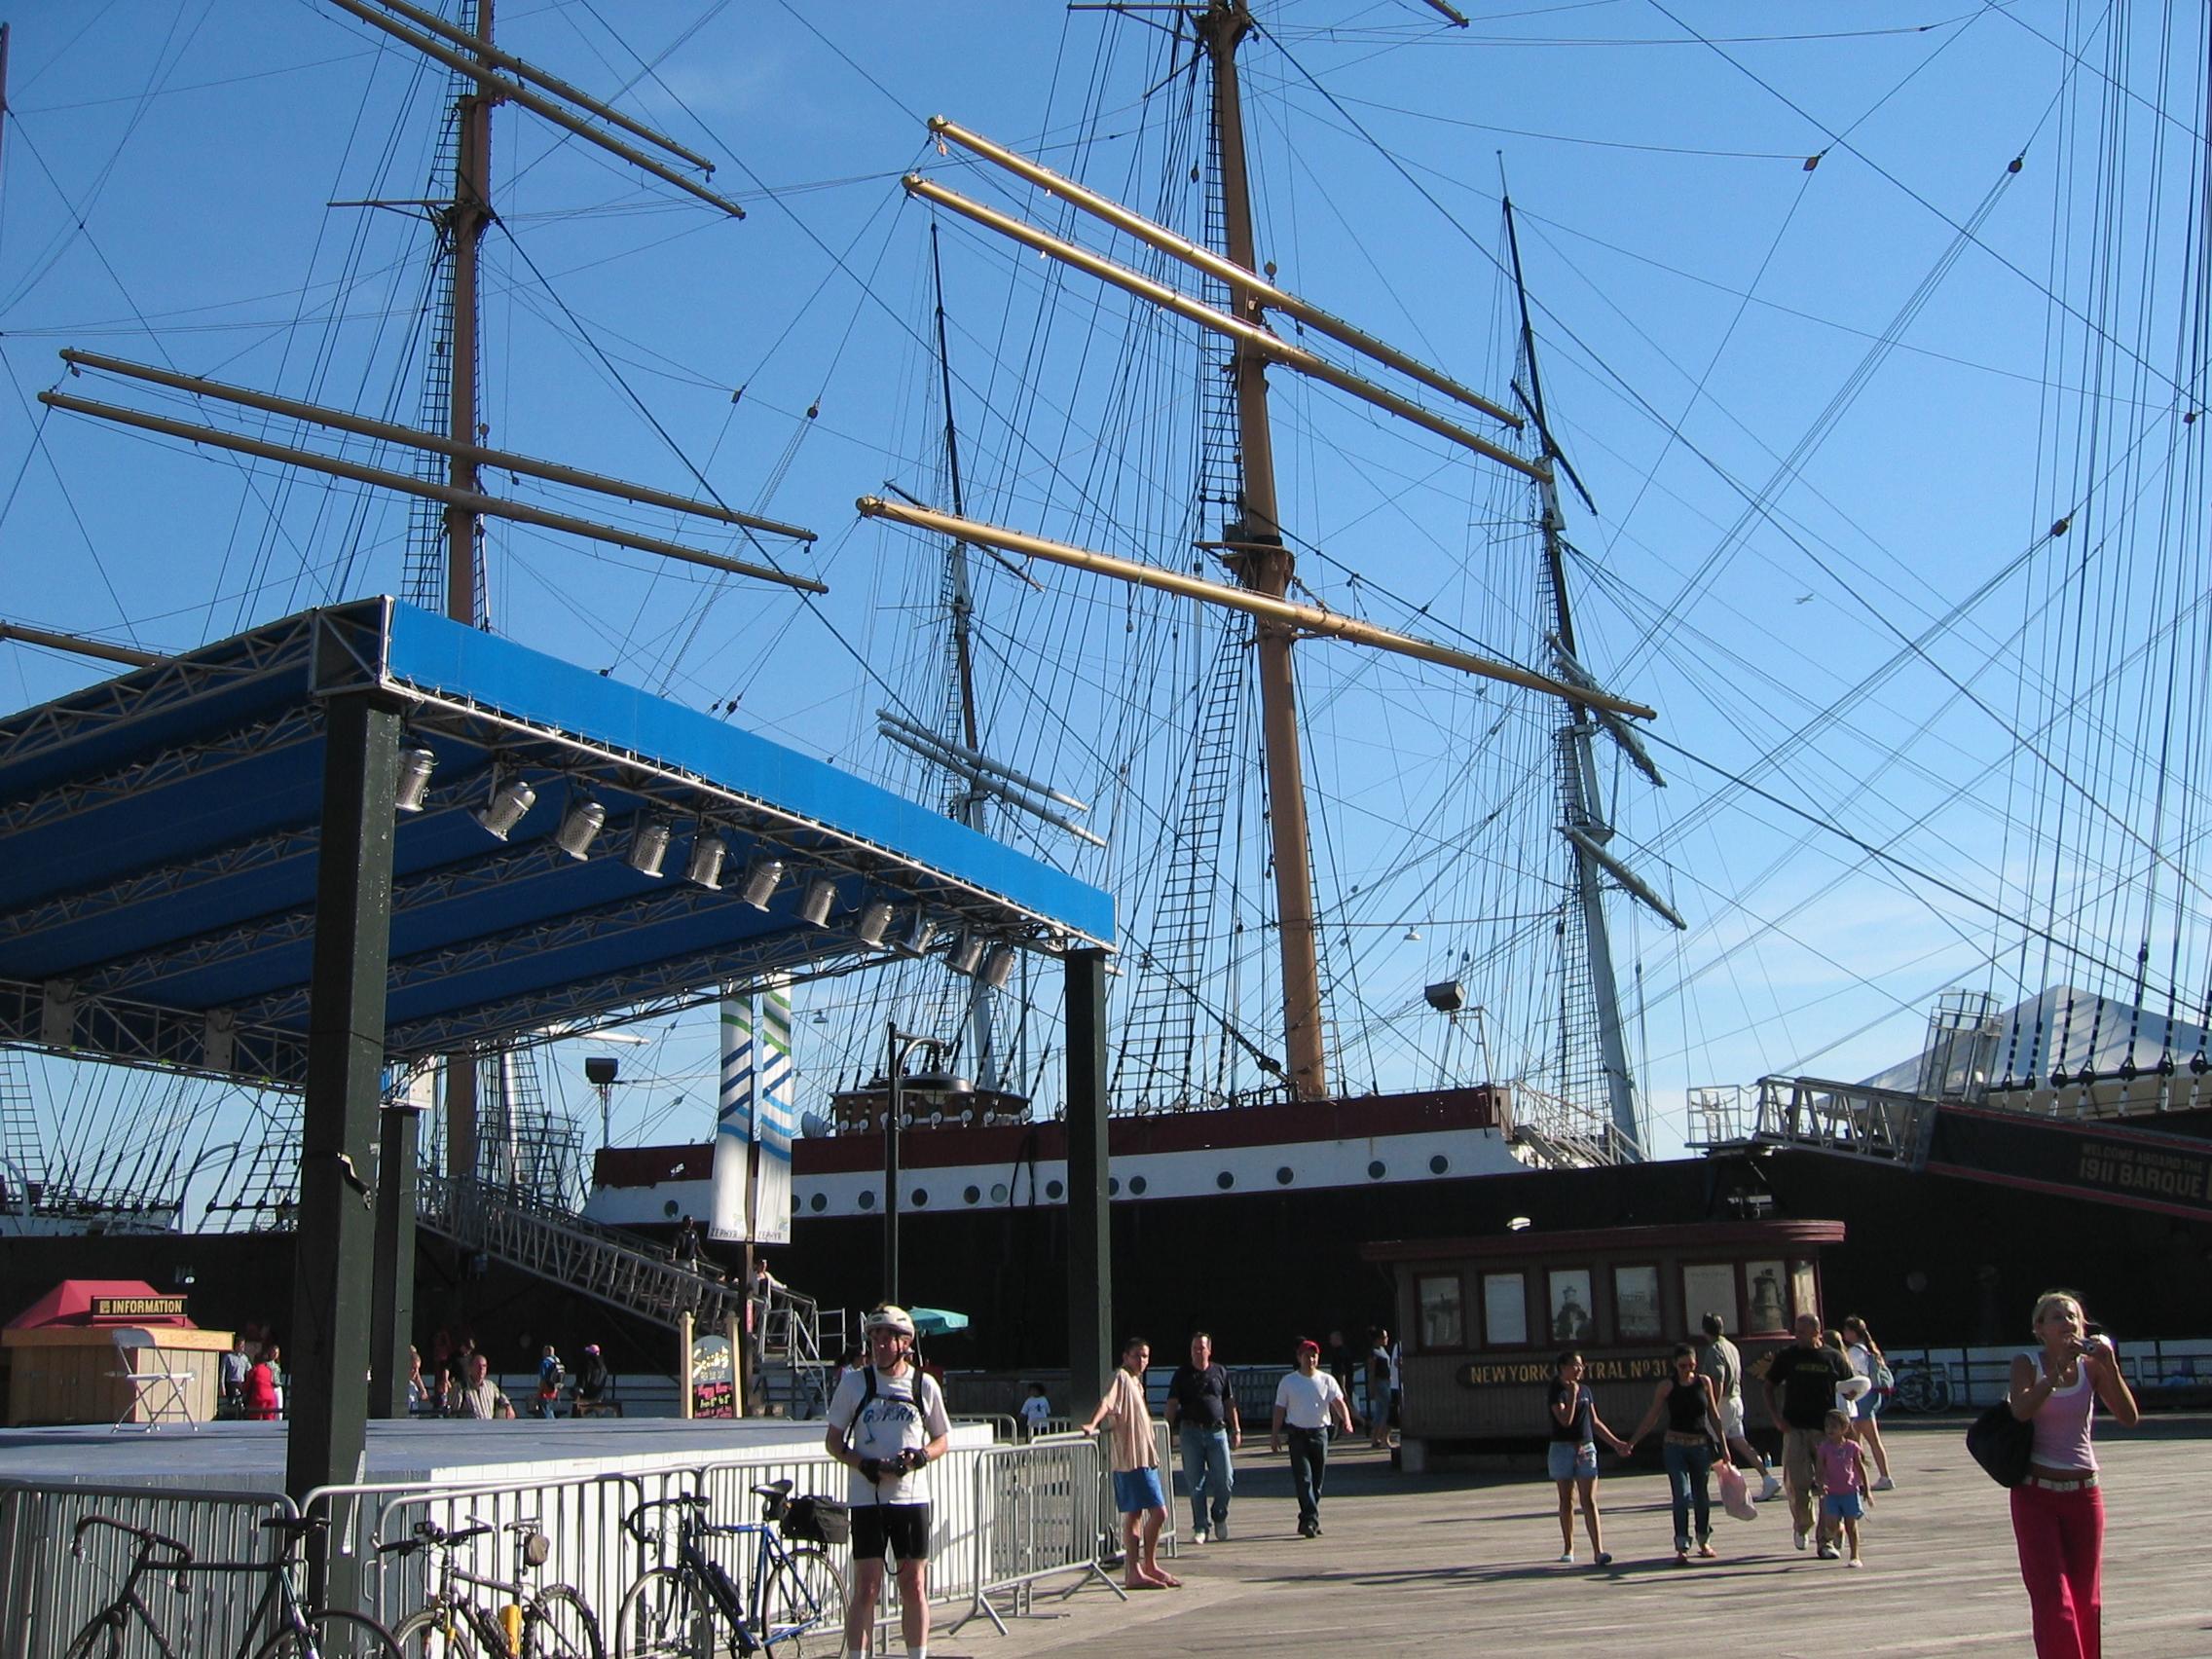 South Street Seaport, New York